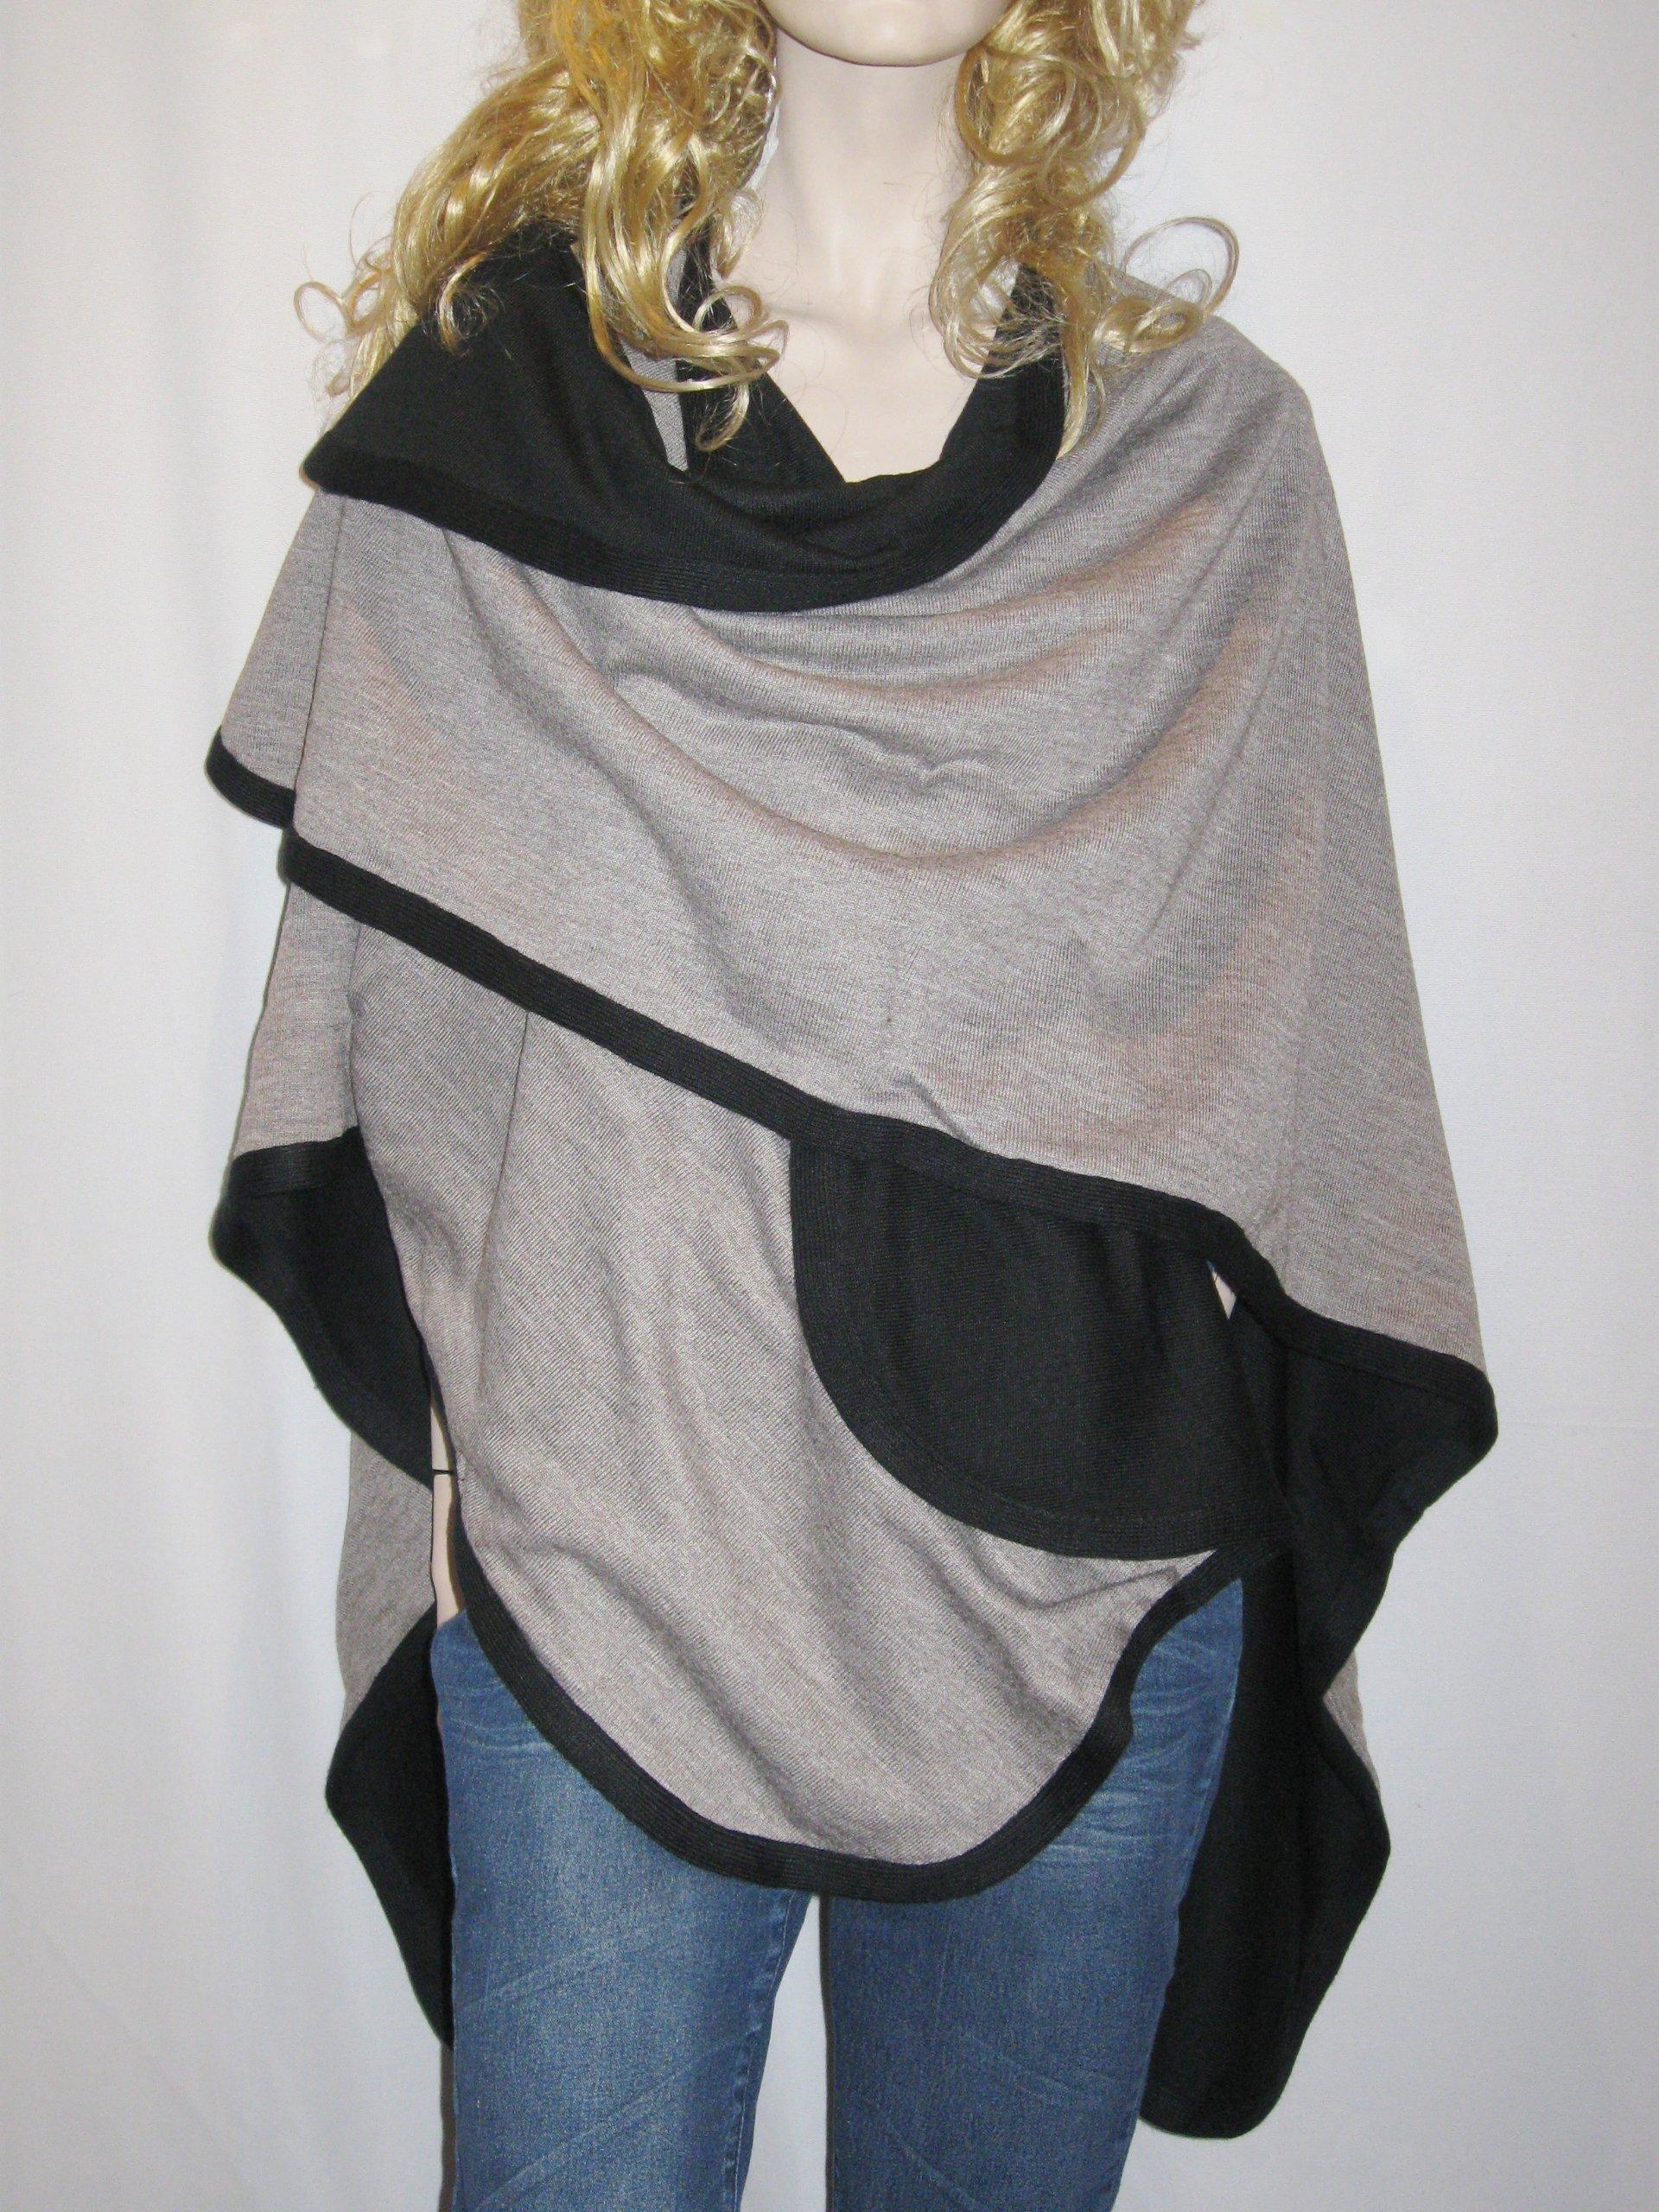 Cashmere Pashmina Group- Cape Woolen Reversible Ruana Knitted Poncho Shawl Cardigans Sweater Coat (Black/ Stone) by Cashmere Pashmina Group (Image #5)